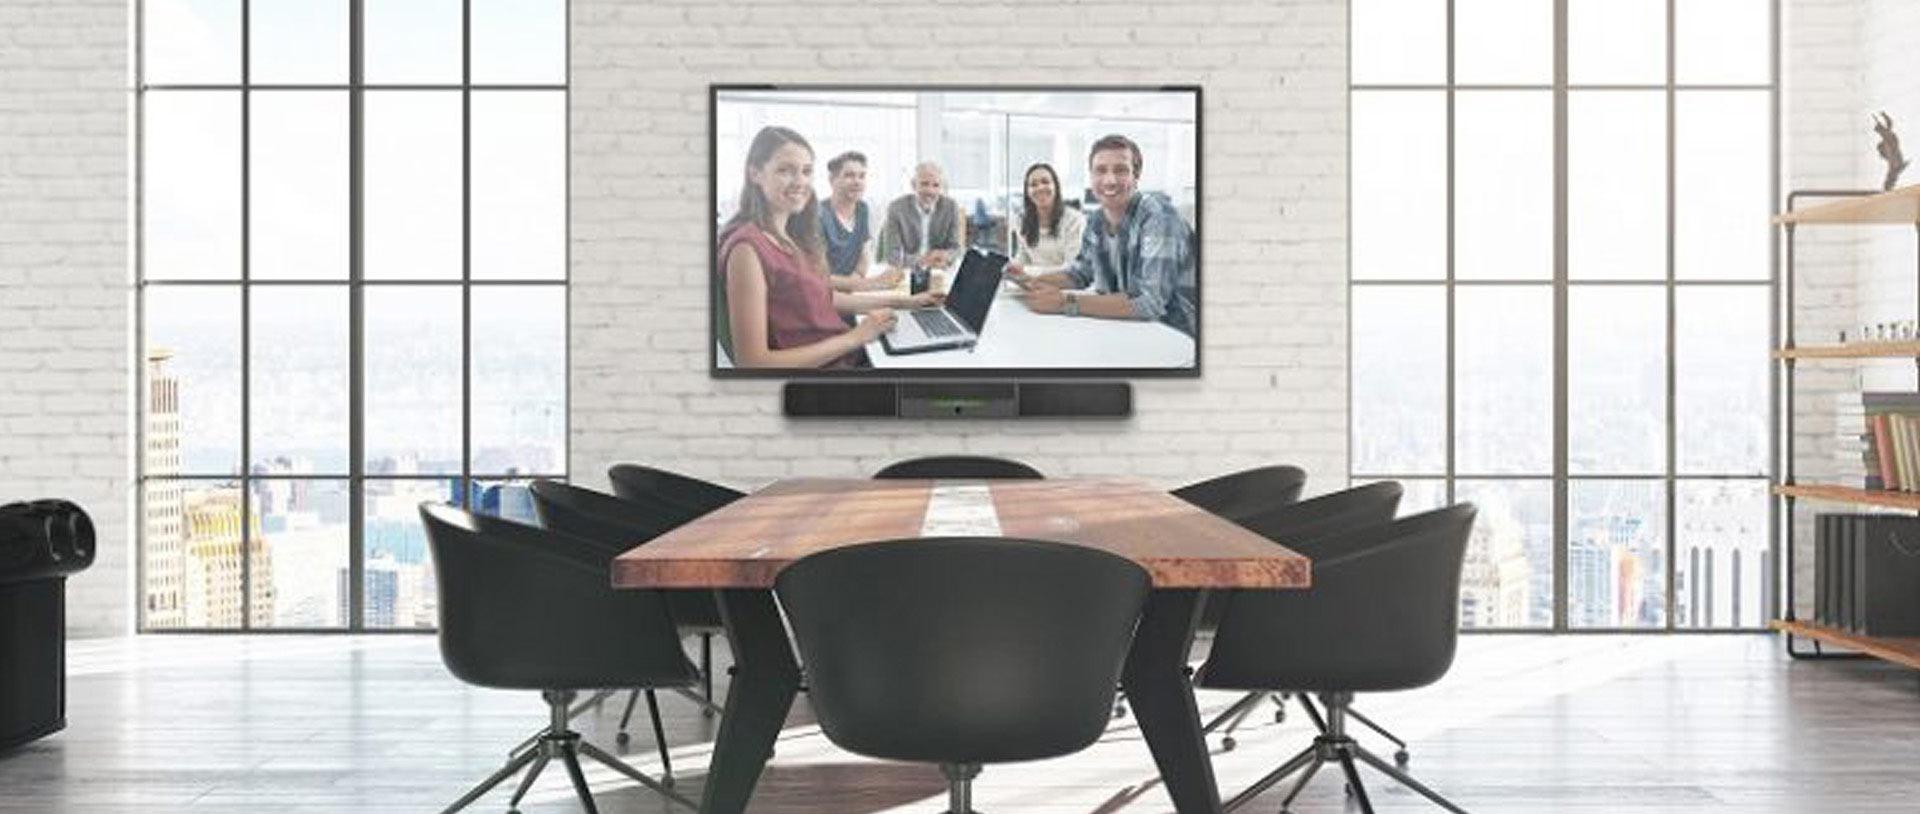 Videokonferenz Technik Düsseldorf